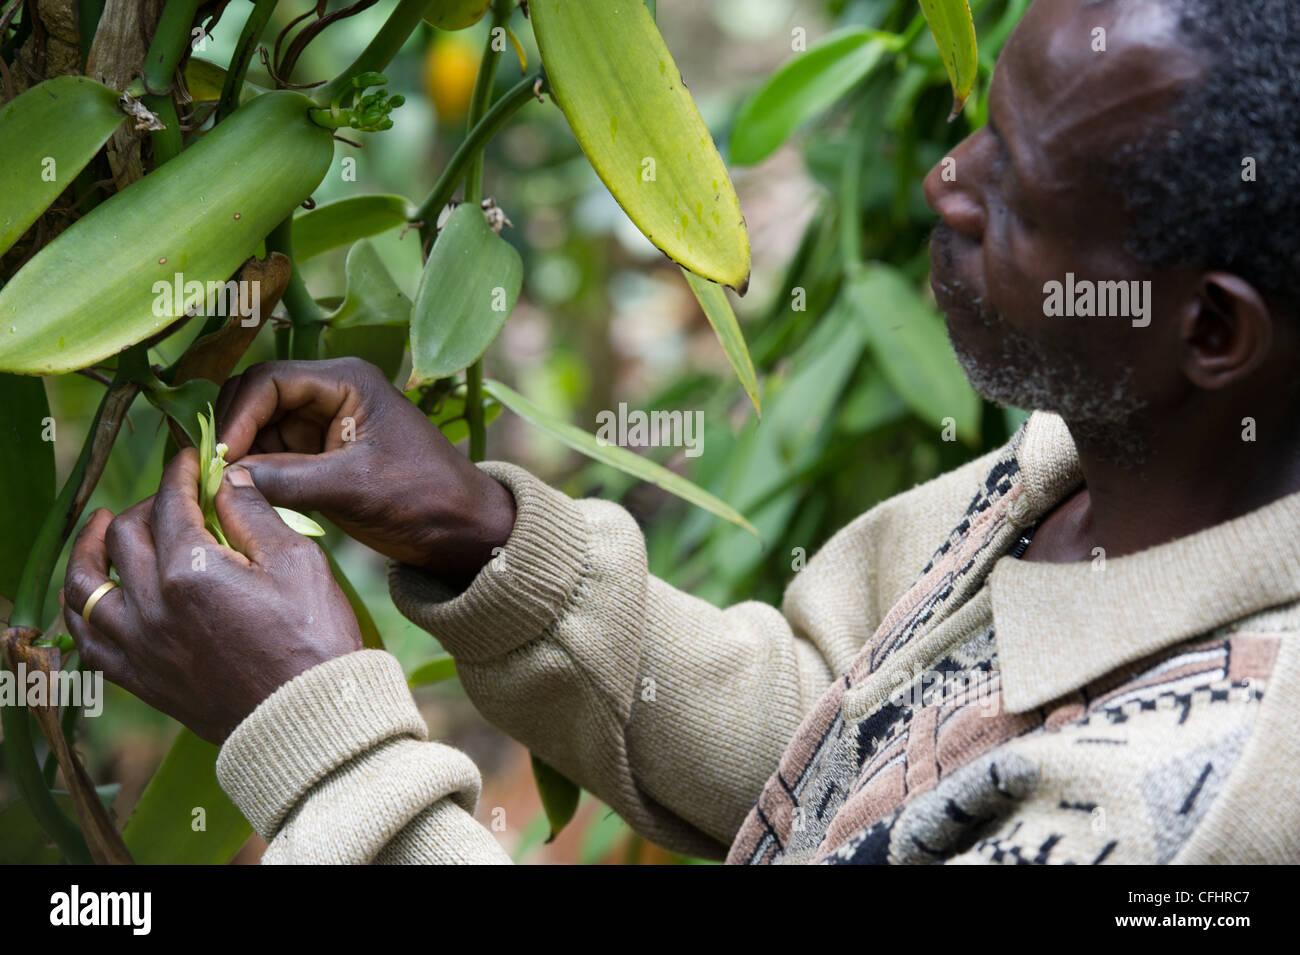 A  farmer fertilizes vanilla flowers on his farm in the Rwenzori Mountains near Bundibugyo, Uganda. - Stock Image